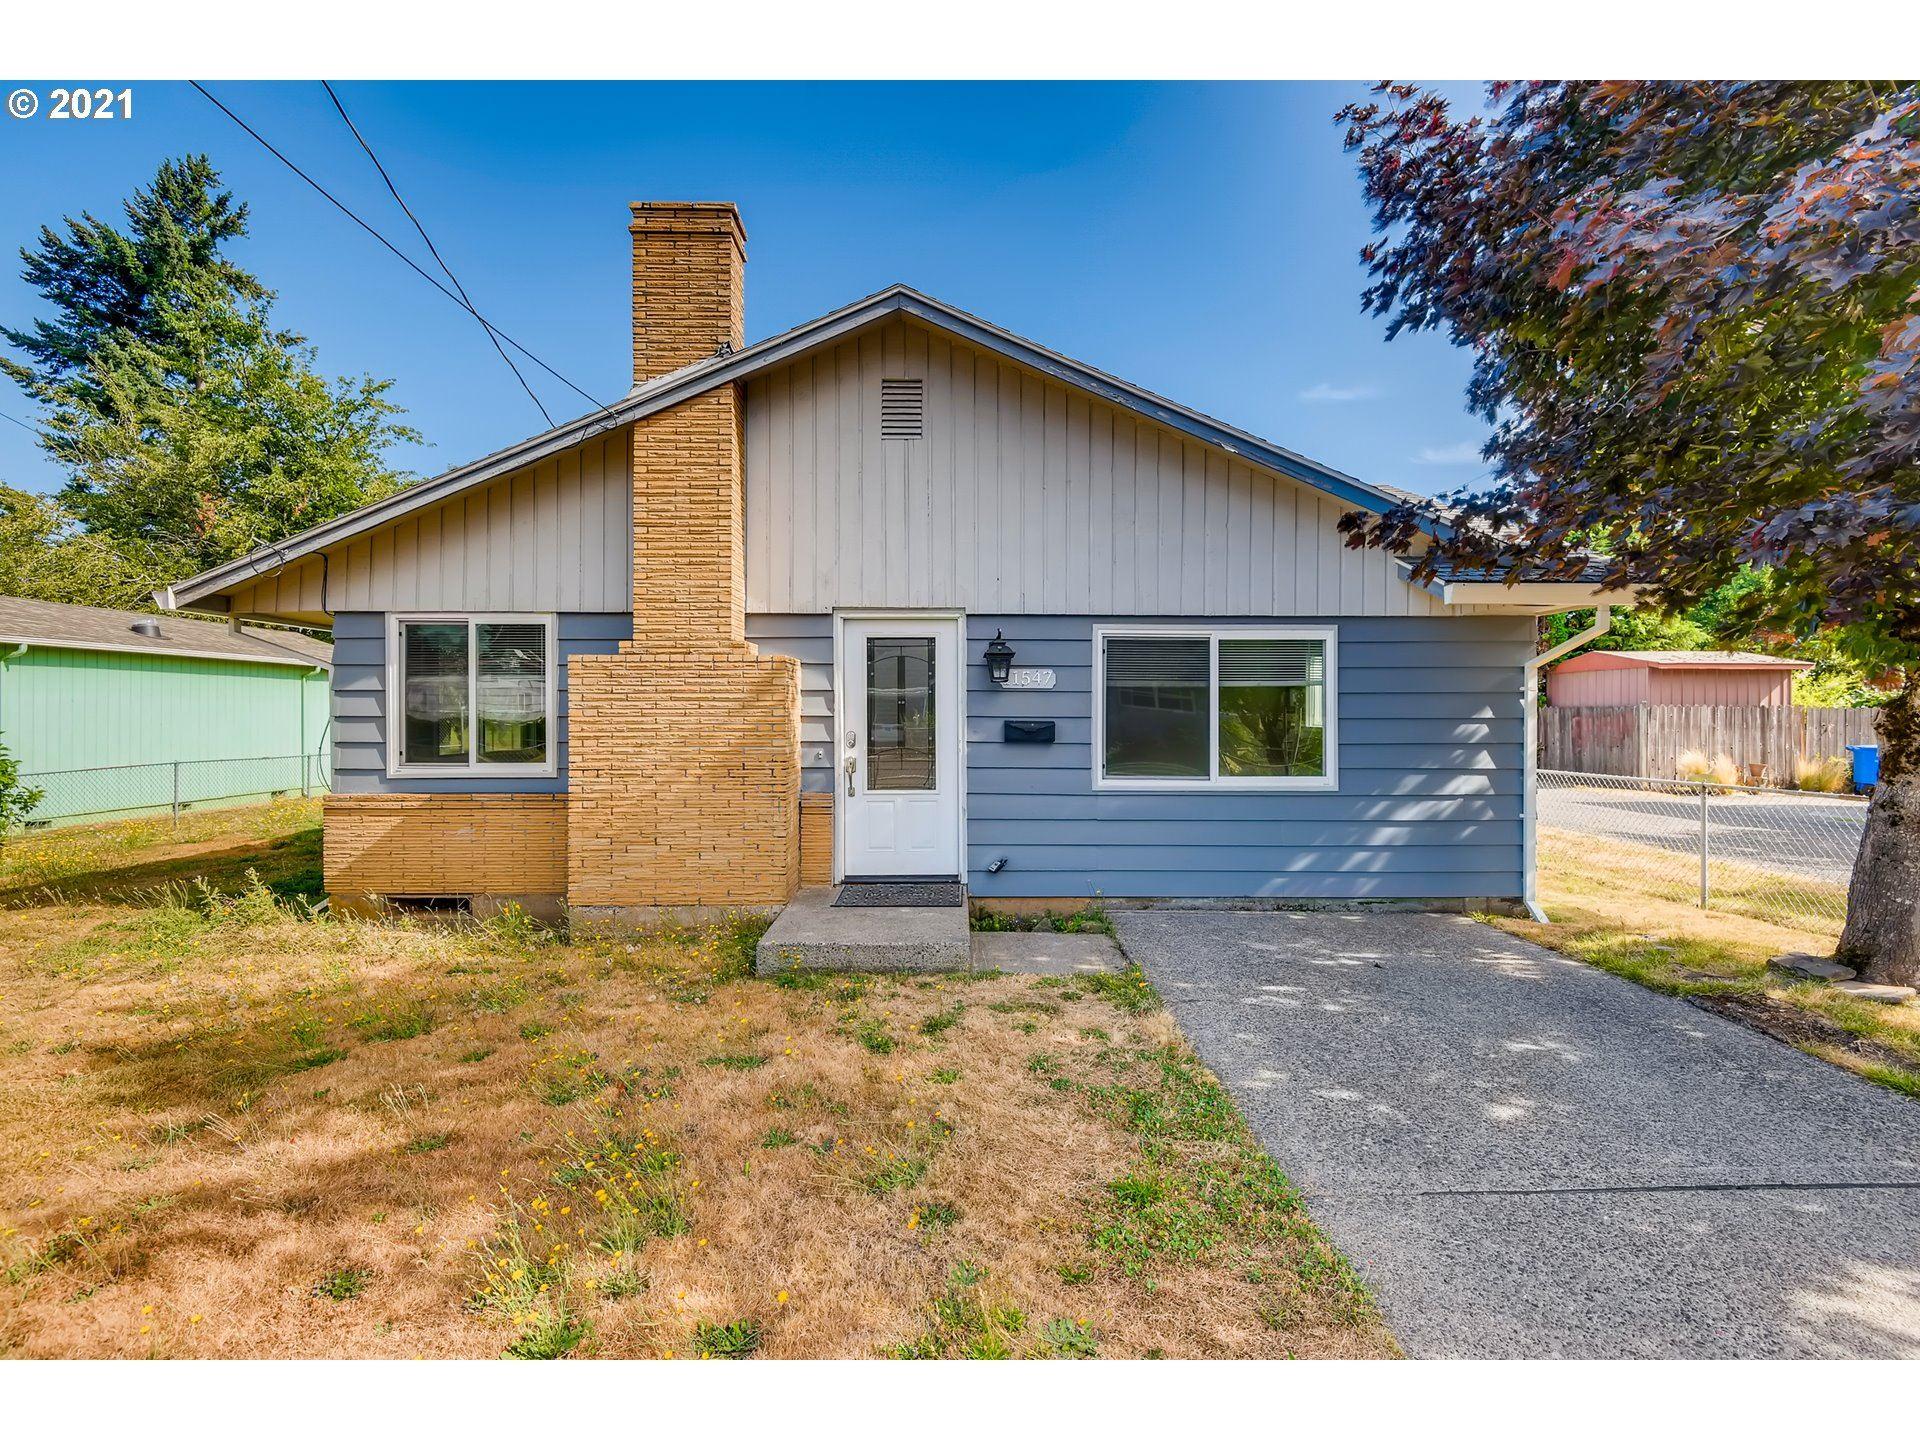 11547 NE SAN RAFAEL ST, Portland, OR 97220 - MLS#: 21043417